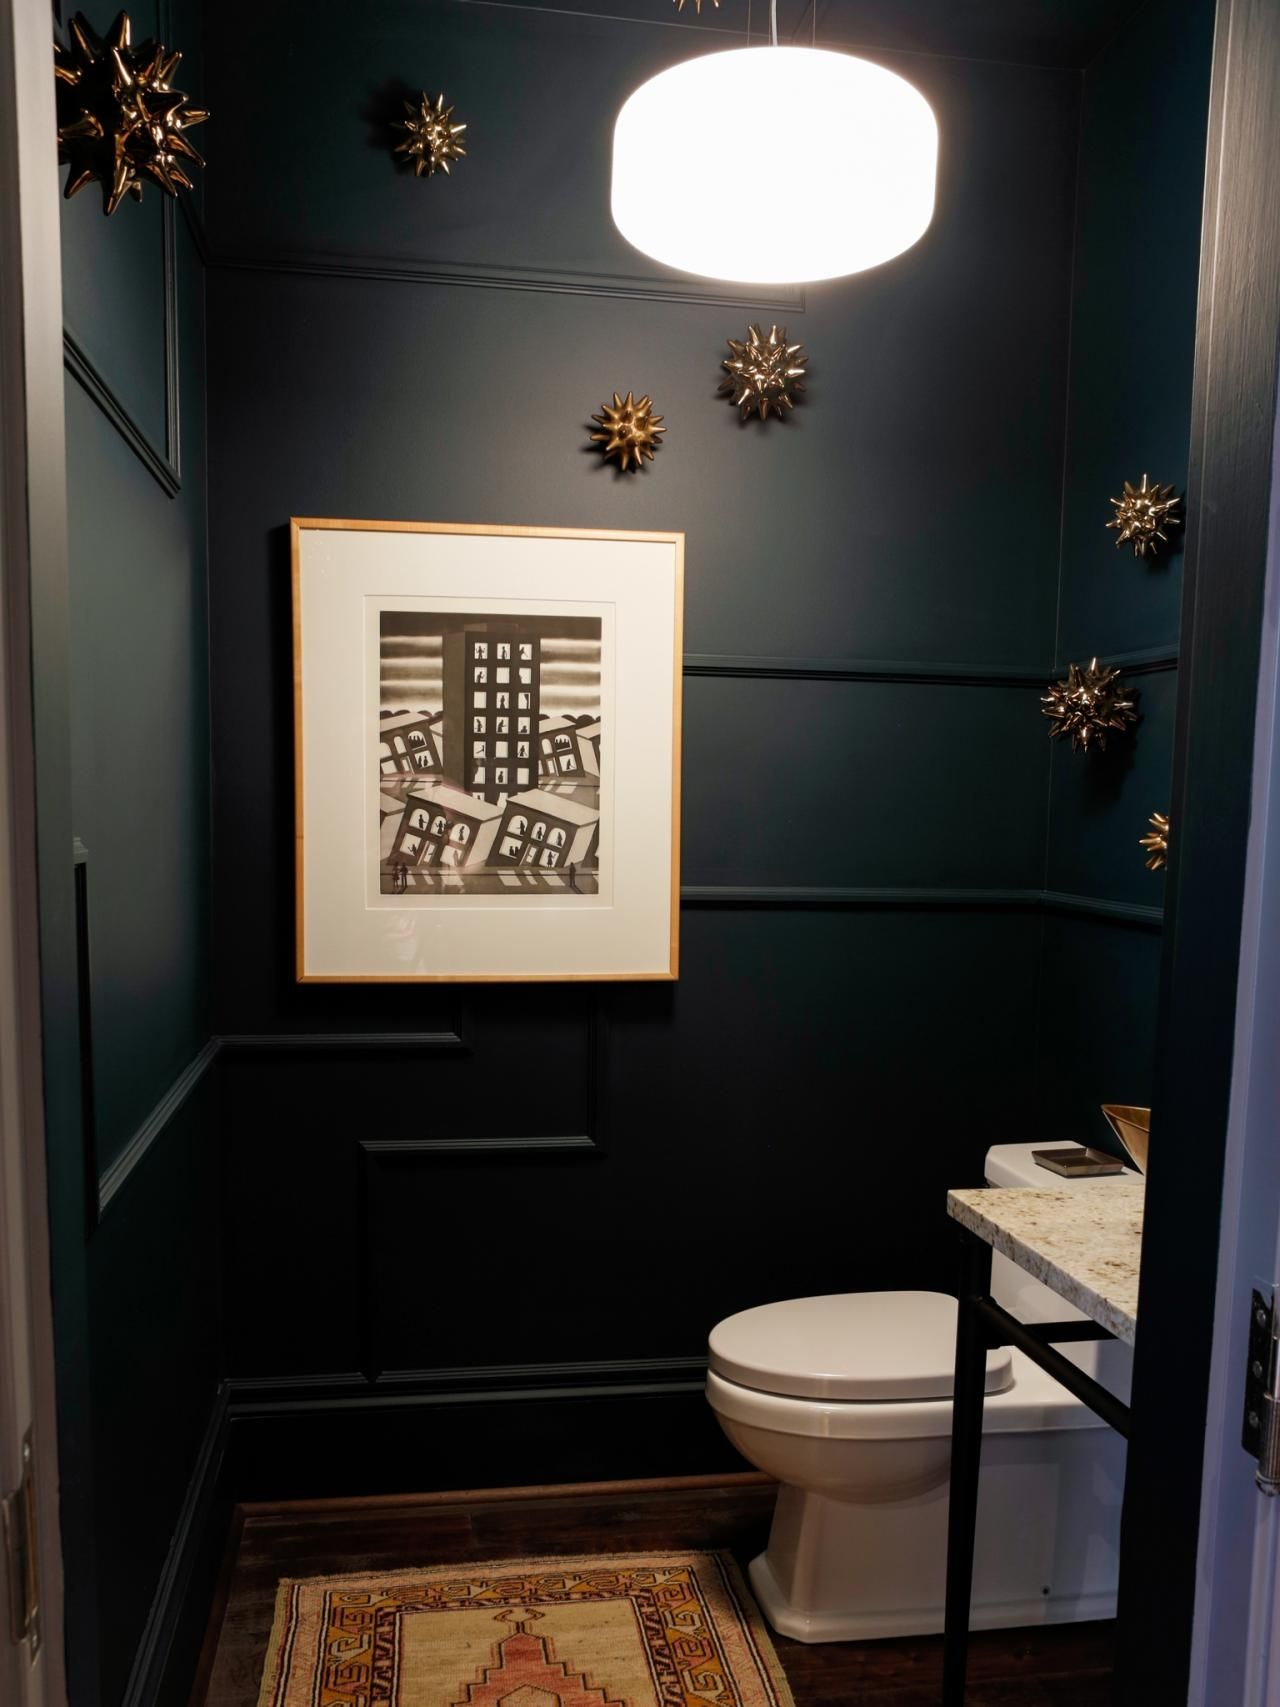 Cool Small Rustic Modern Bathroom Decorating Ideas Dark Brown Wooden Floor Porcelain White Toilet Blac Half Bathroom Decor Small Dark Bathroom Stylish Bathroom